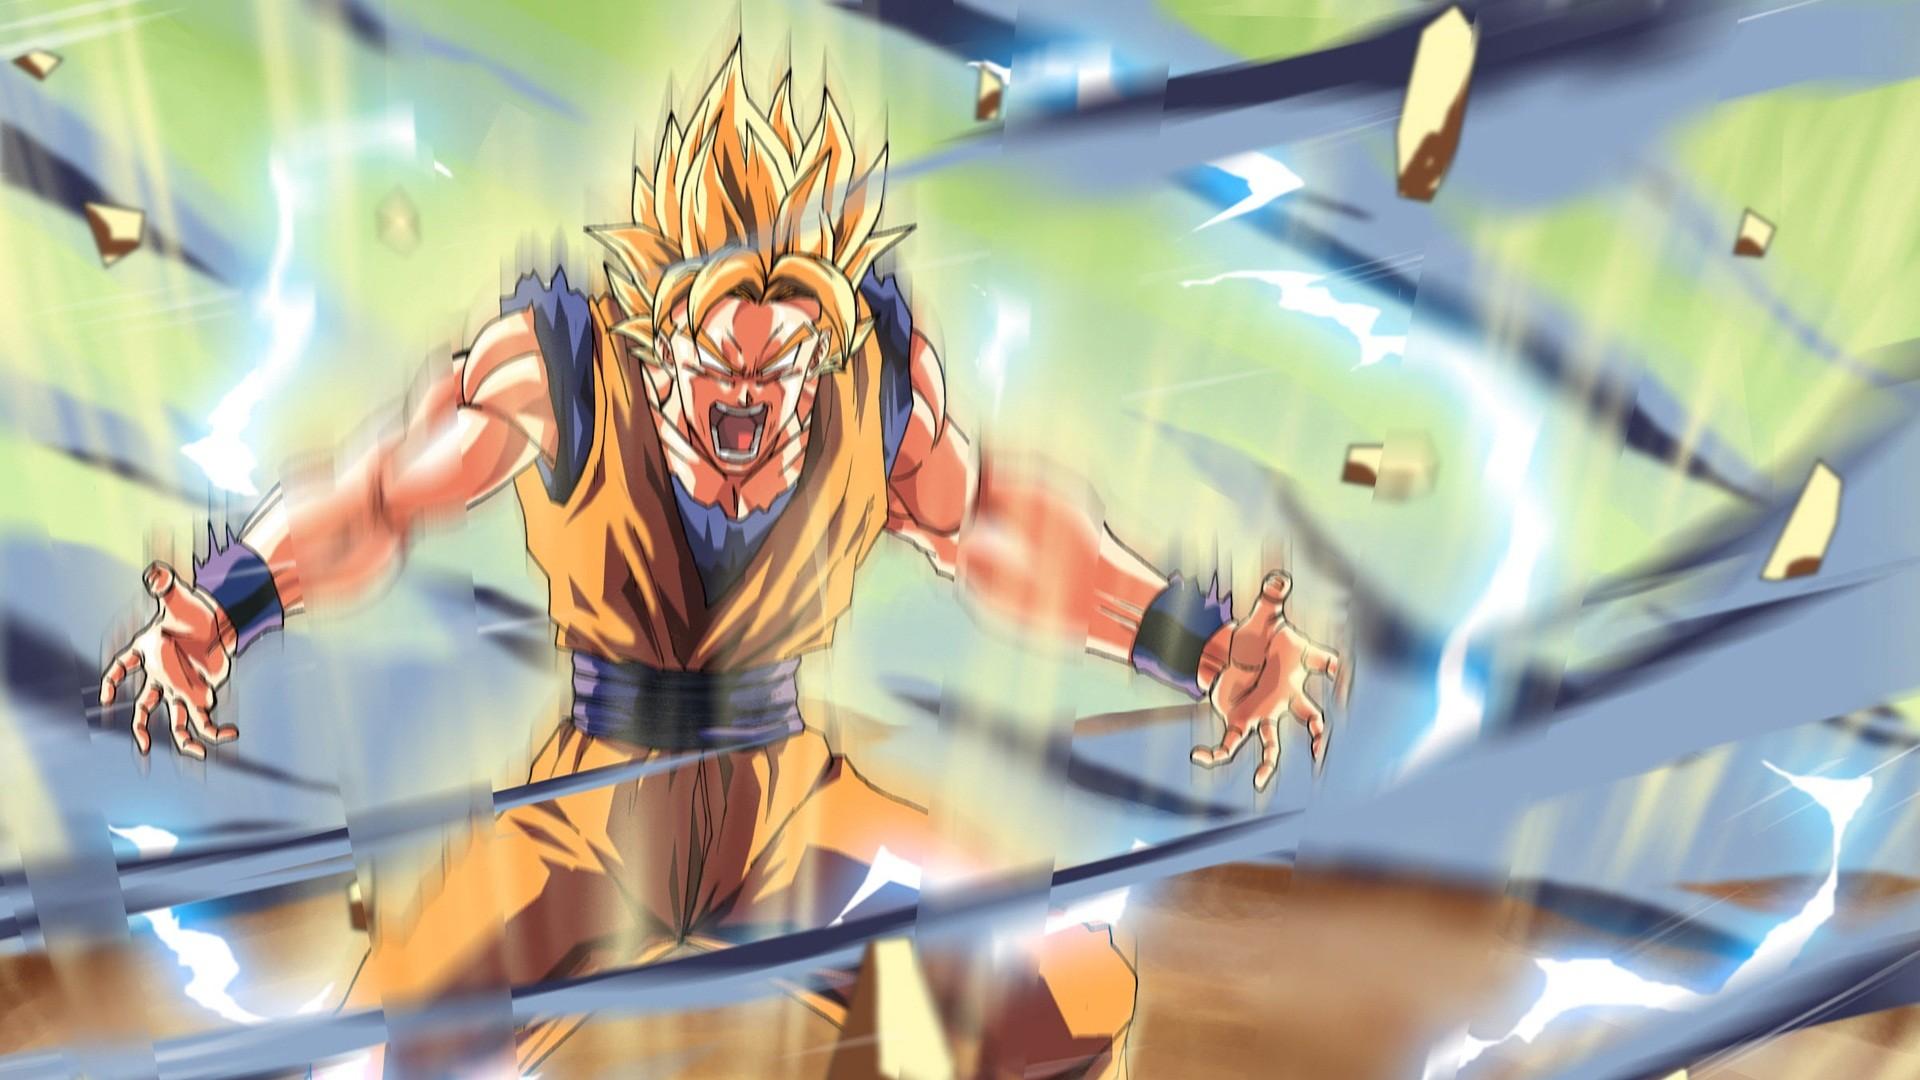 DeviantArt: More Like Goku Super Saiyan God Wallpaper HD by … | SON GOKU ( DBZ) | Pinterest | Goku super, Goku and deviantART